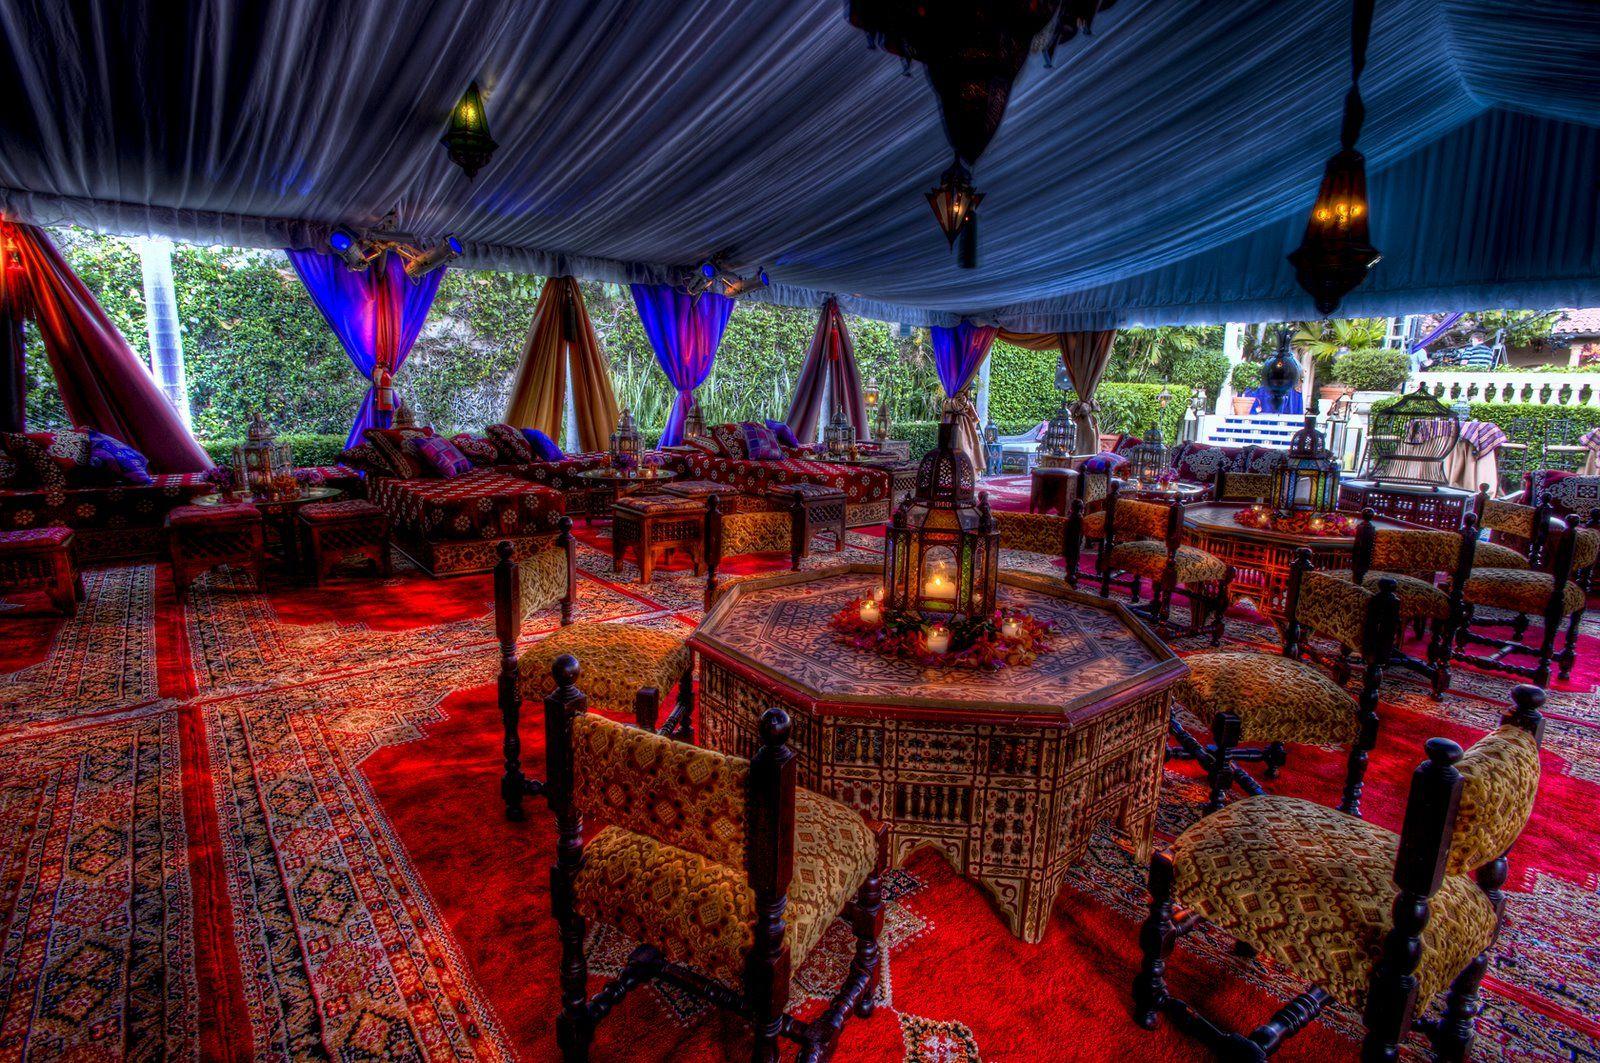 Night wedding decor ideas  Moroccan  Wedding Planning Ideas  Pinterest  Wedding planning and